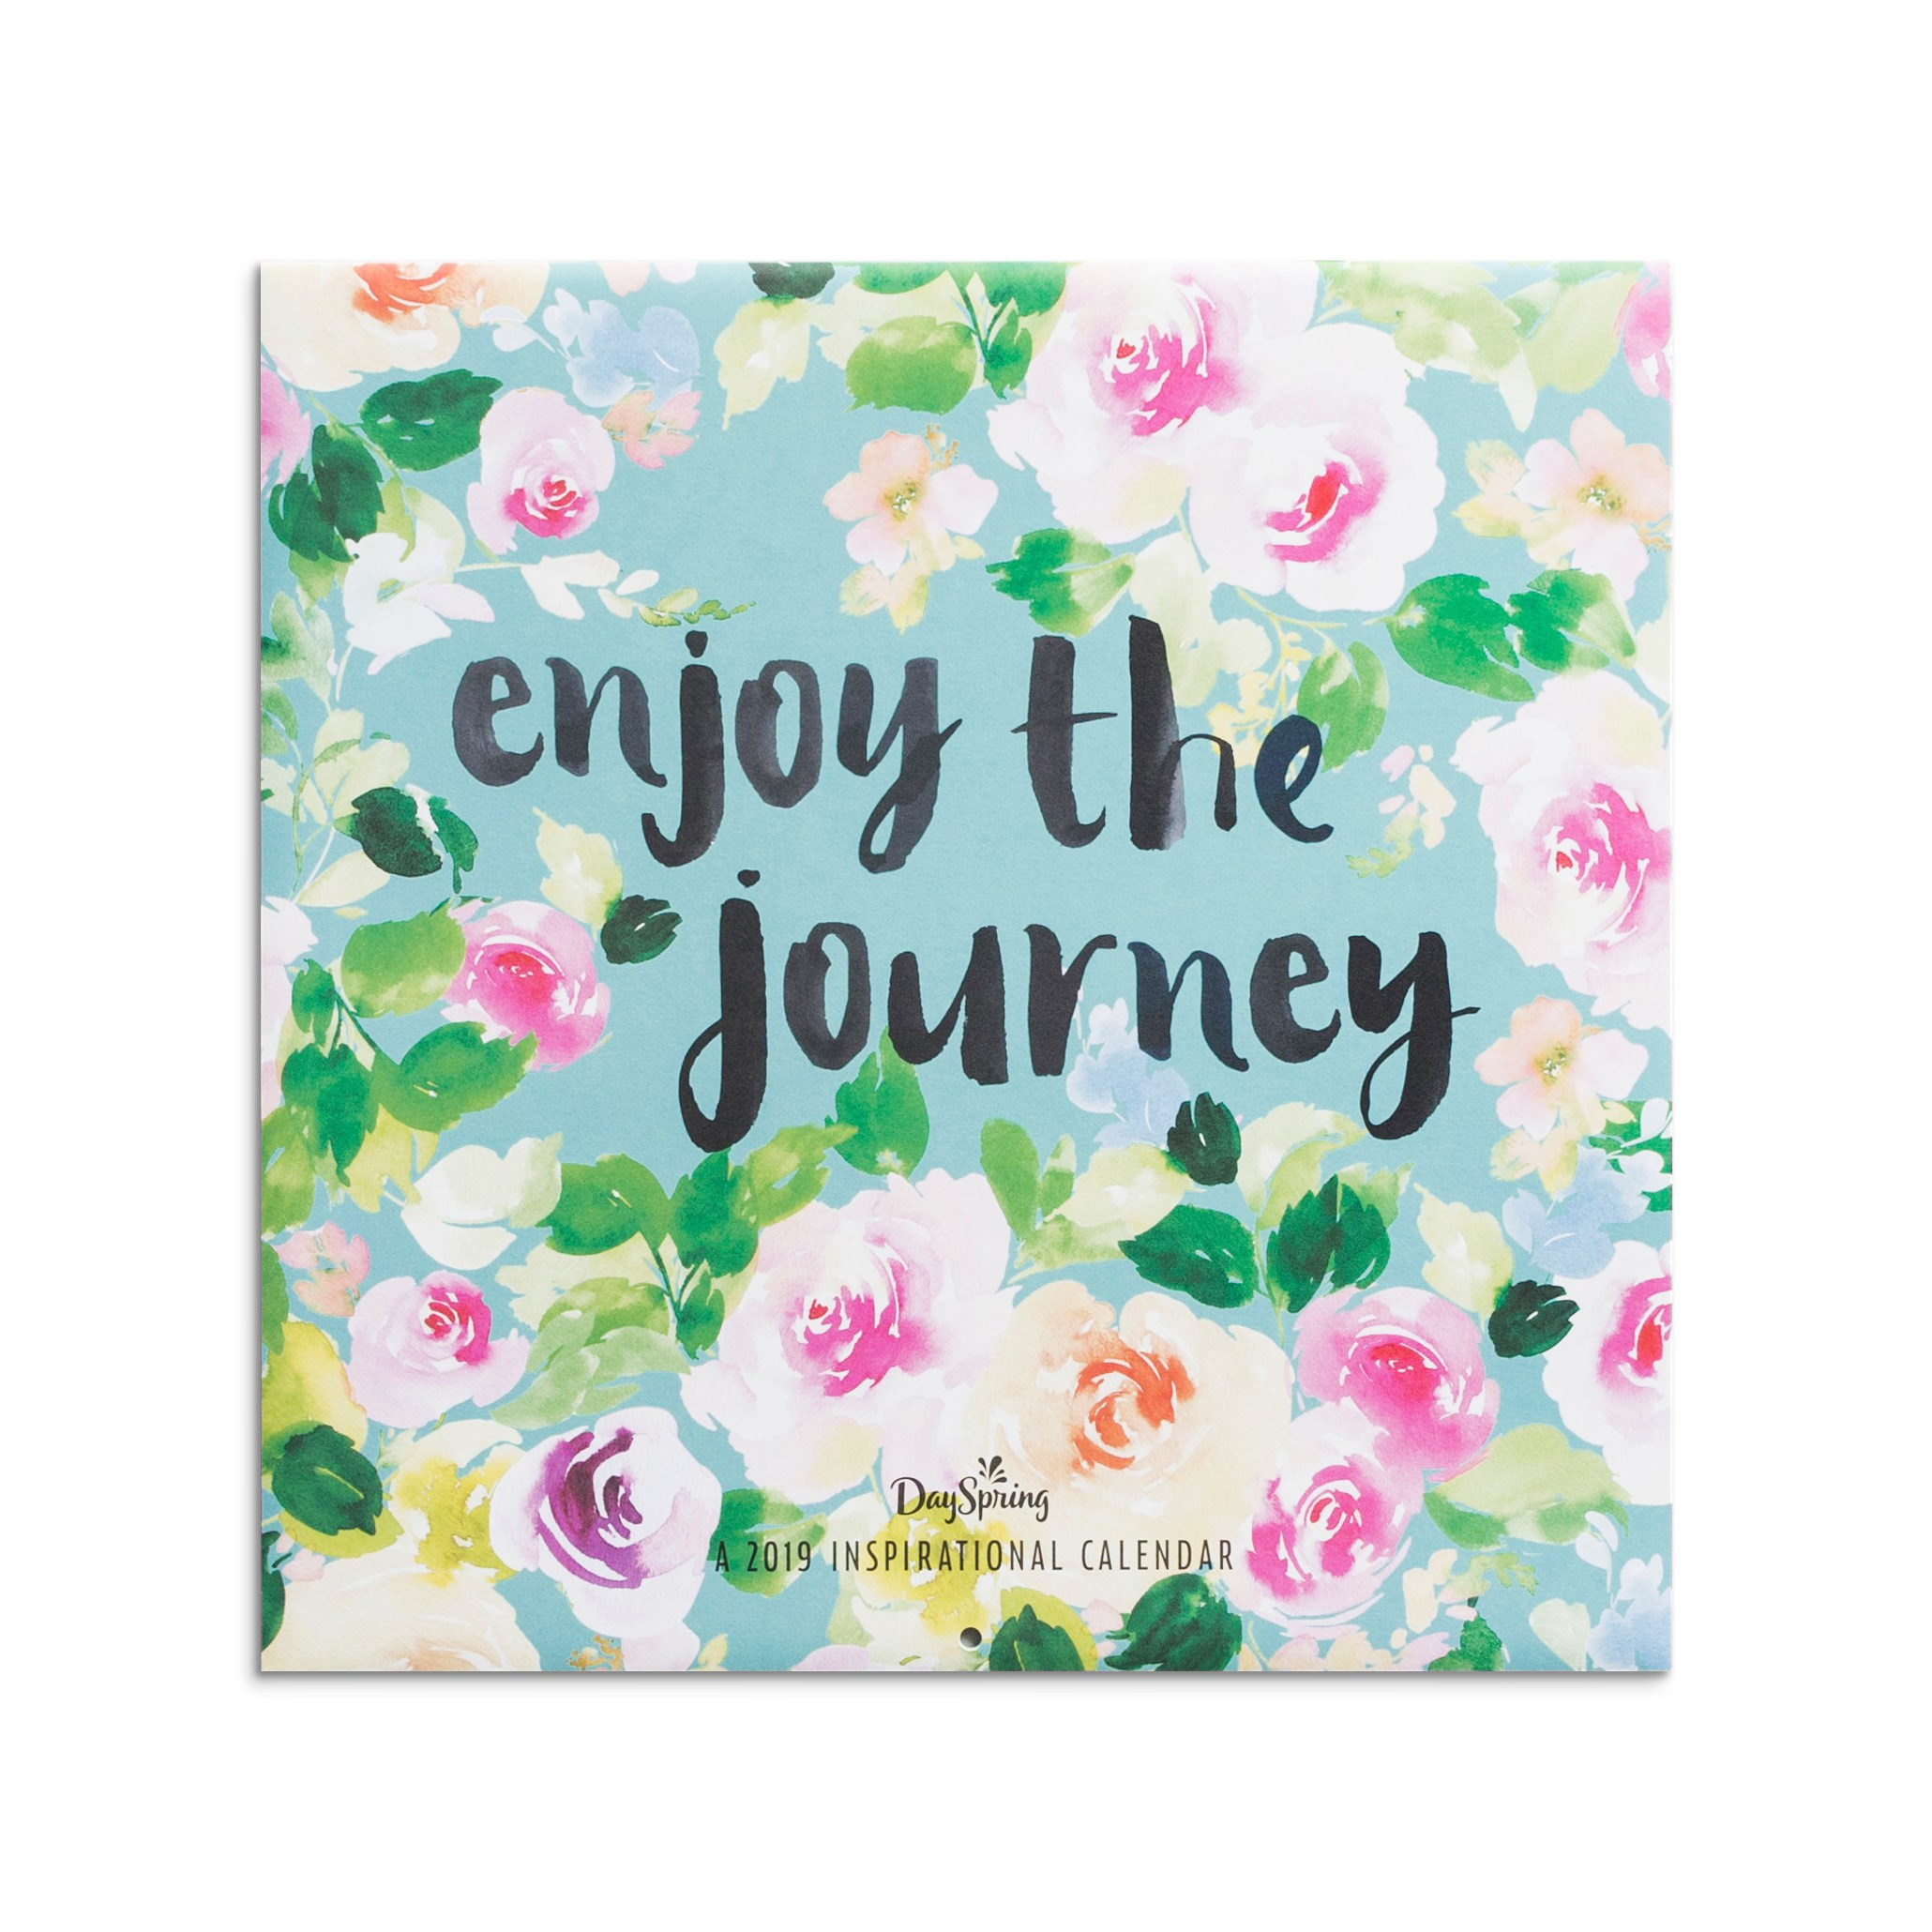 DaySpring  -  DaySpring - 2019 wall Calendar - Enjoy the Journey